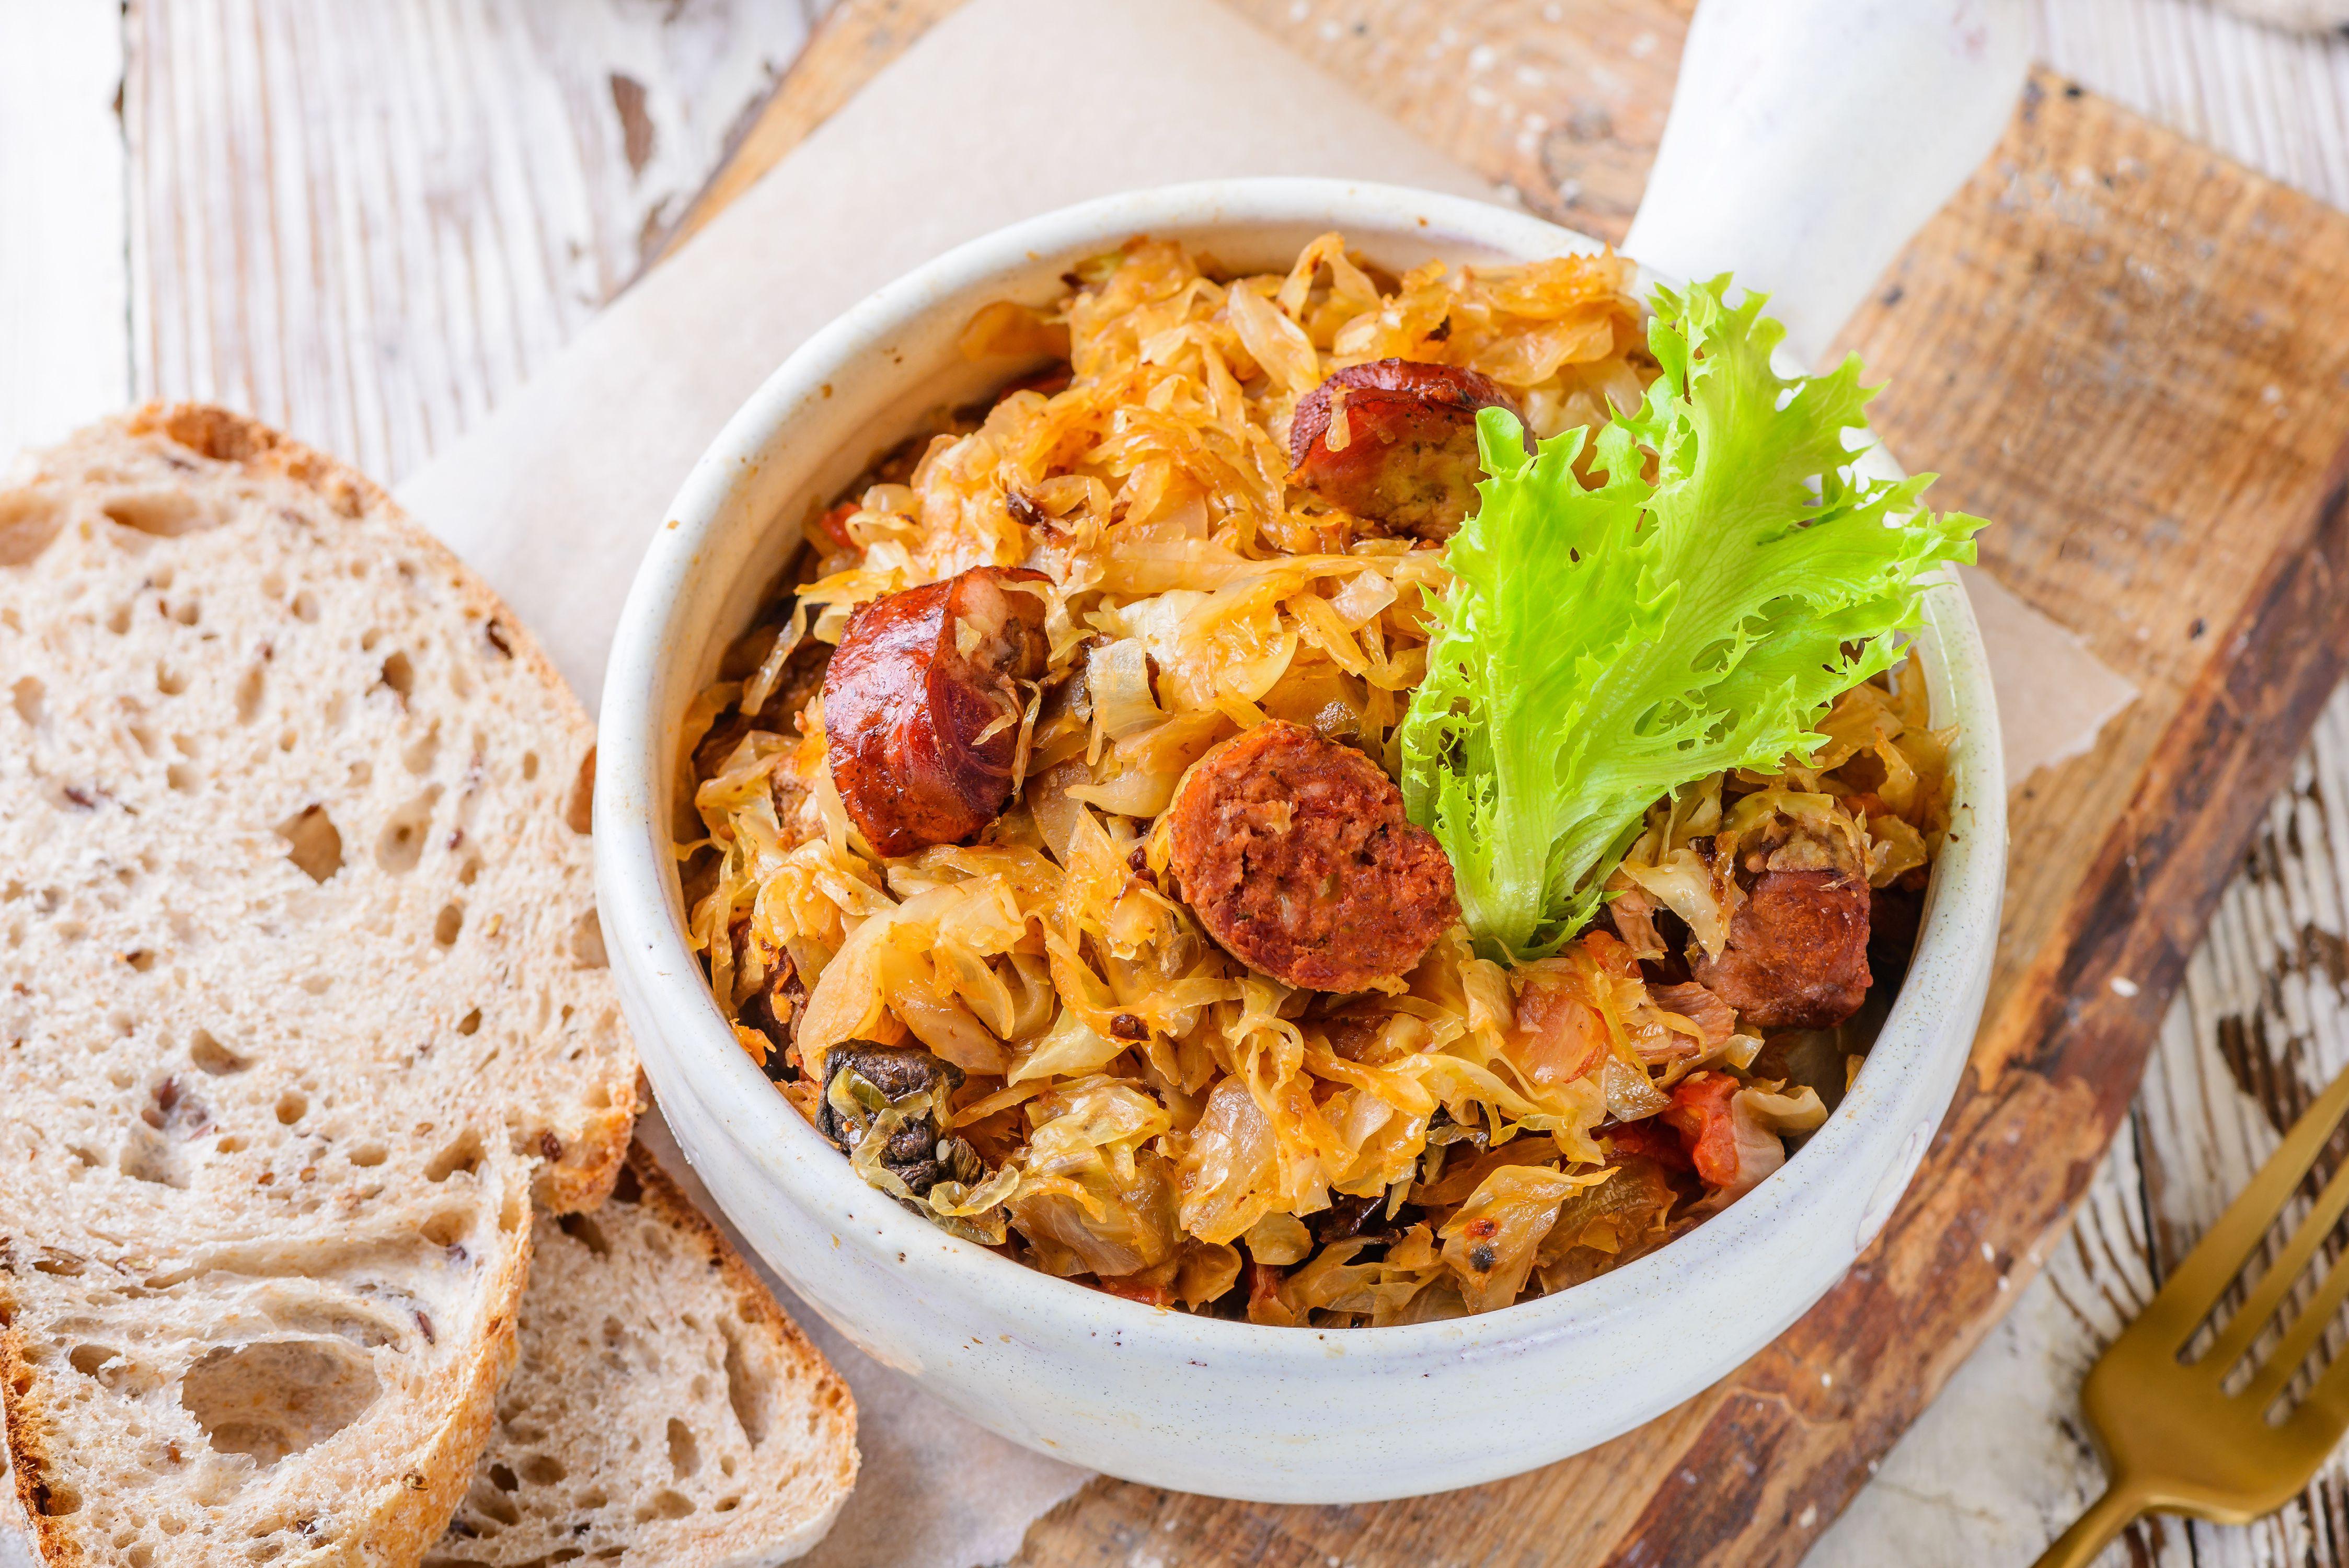 Recipe for Polish Bigos or Hunter's Stew